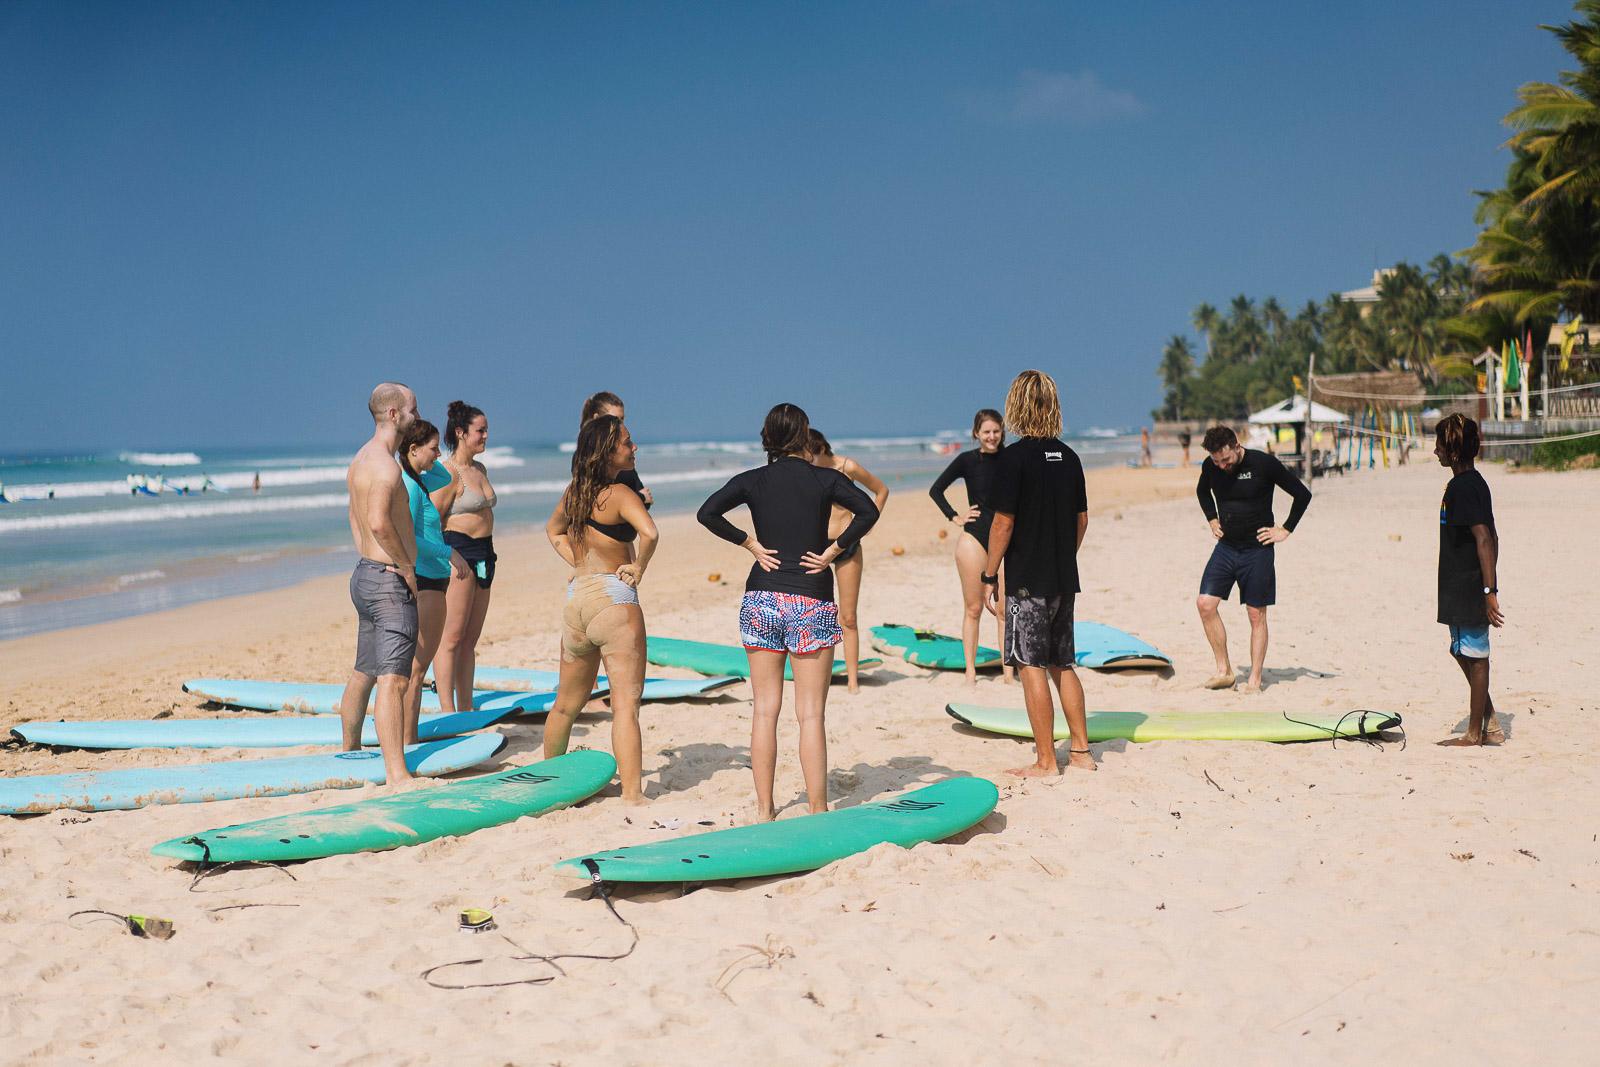 Sunshinestories-surf-travel-blog-8am